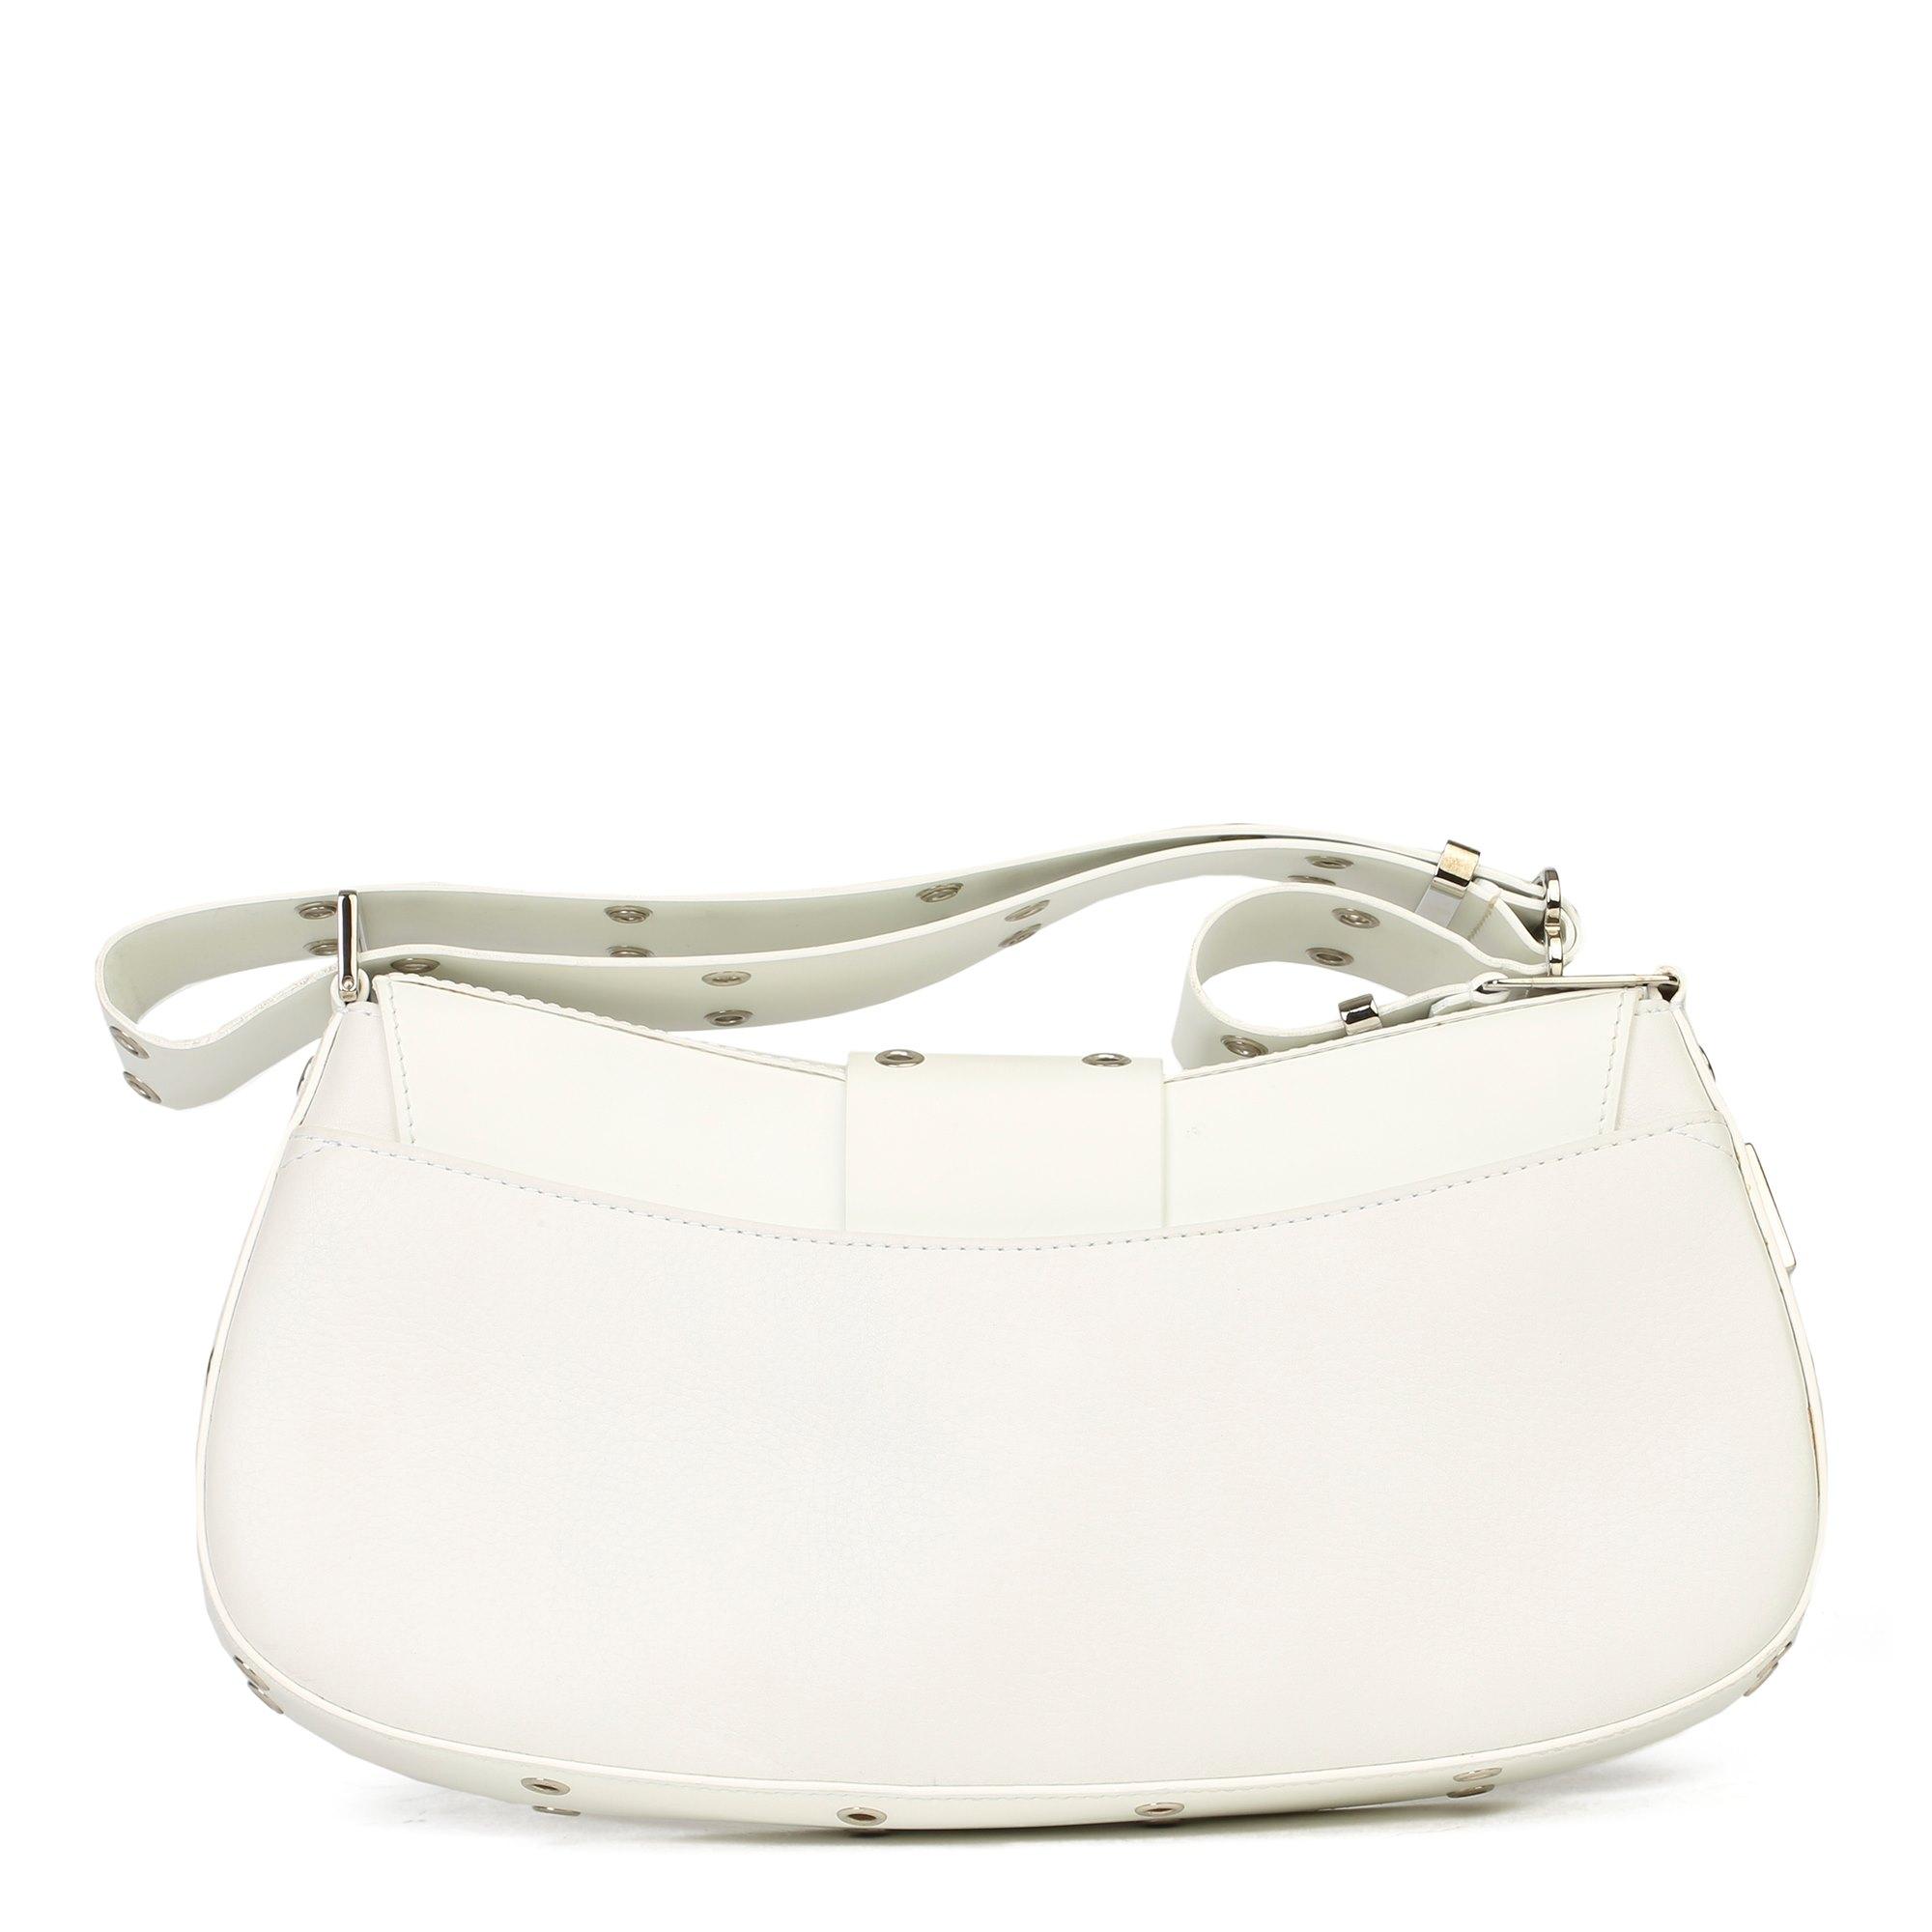 Christian Dior White Calfskin Leather Columbus